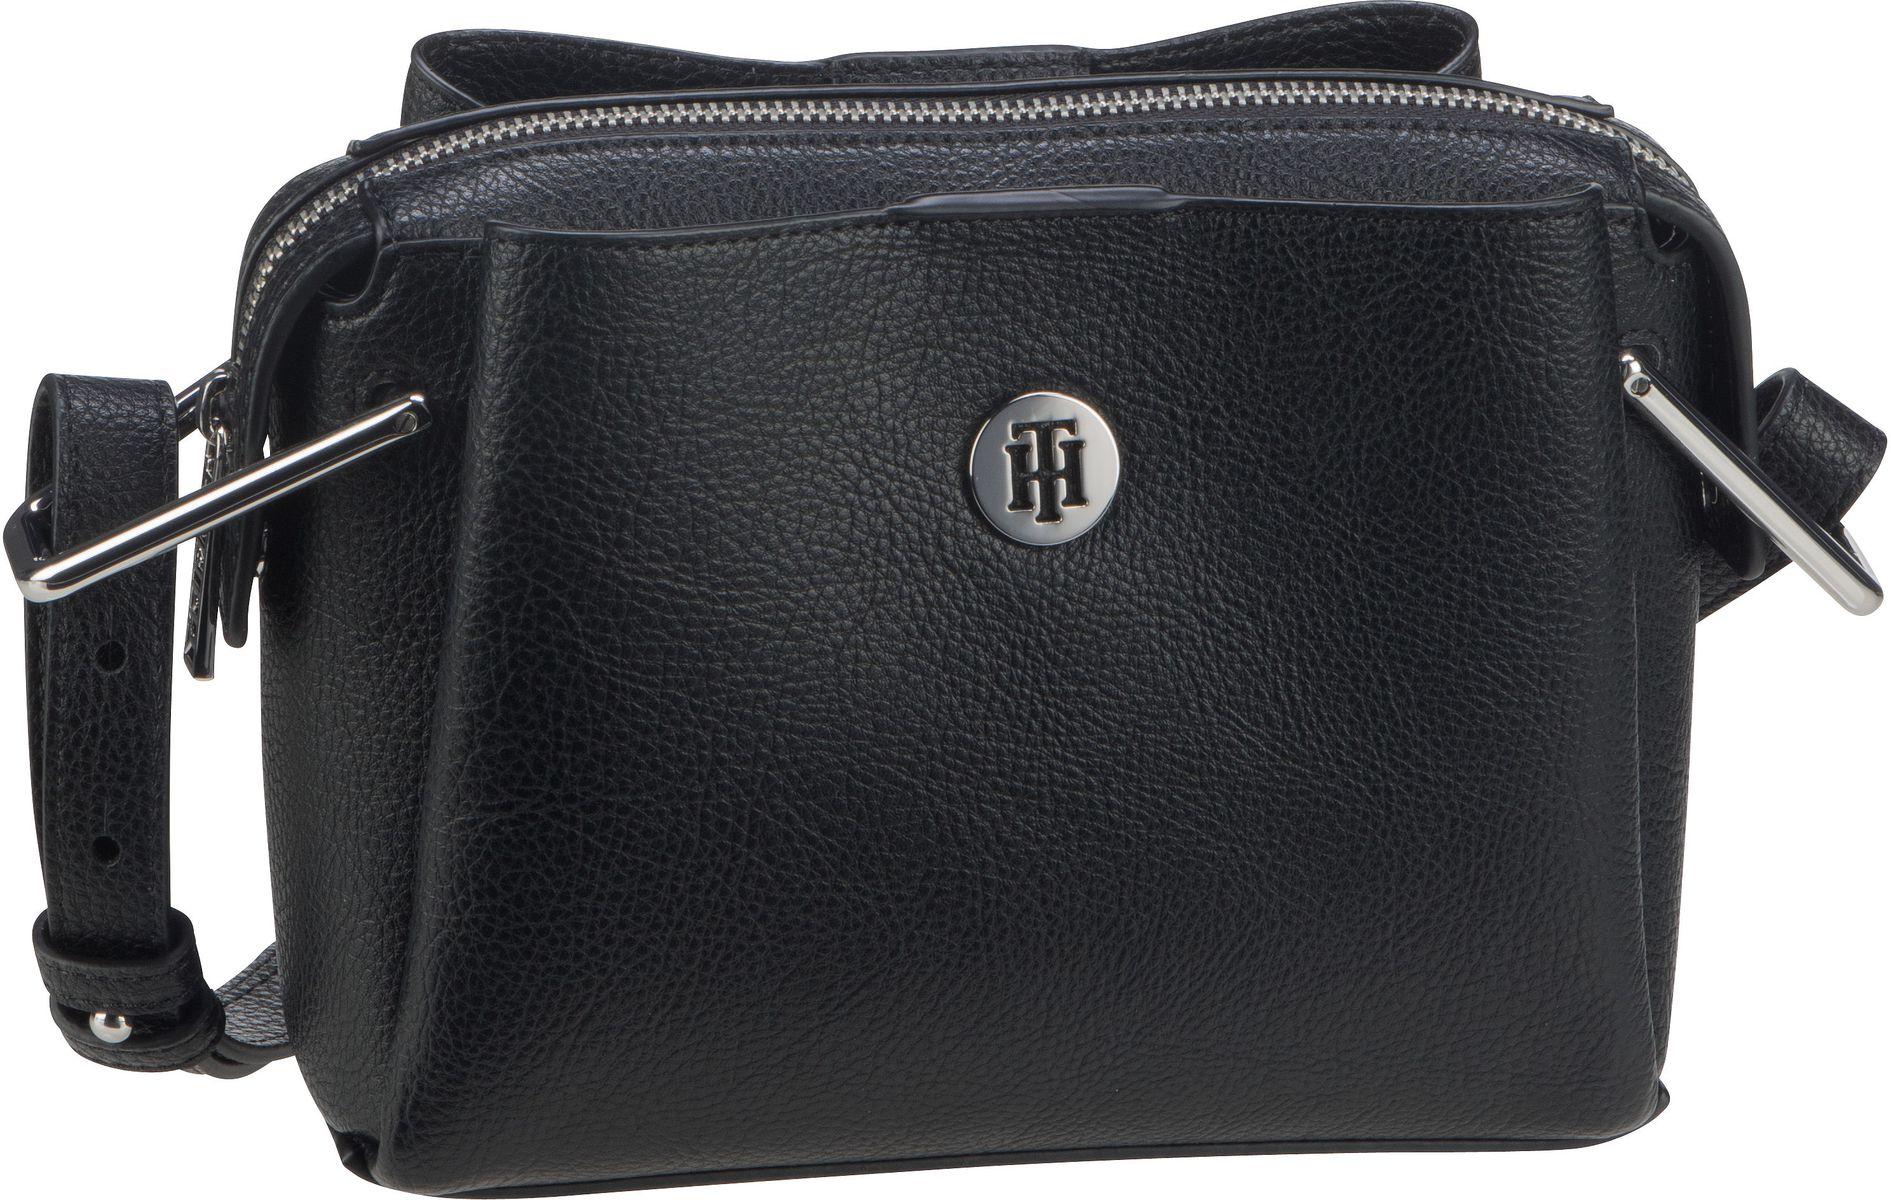 Handtasche TH Core Crossover 6814 Black